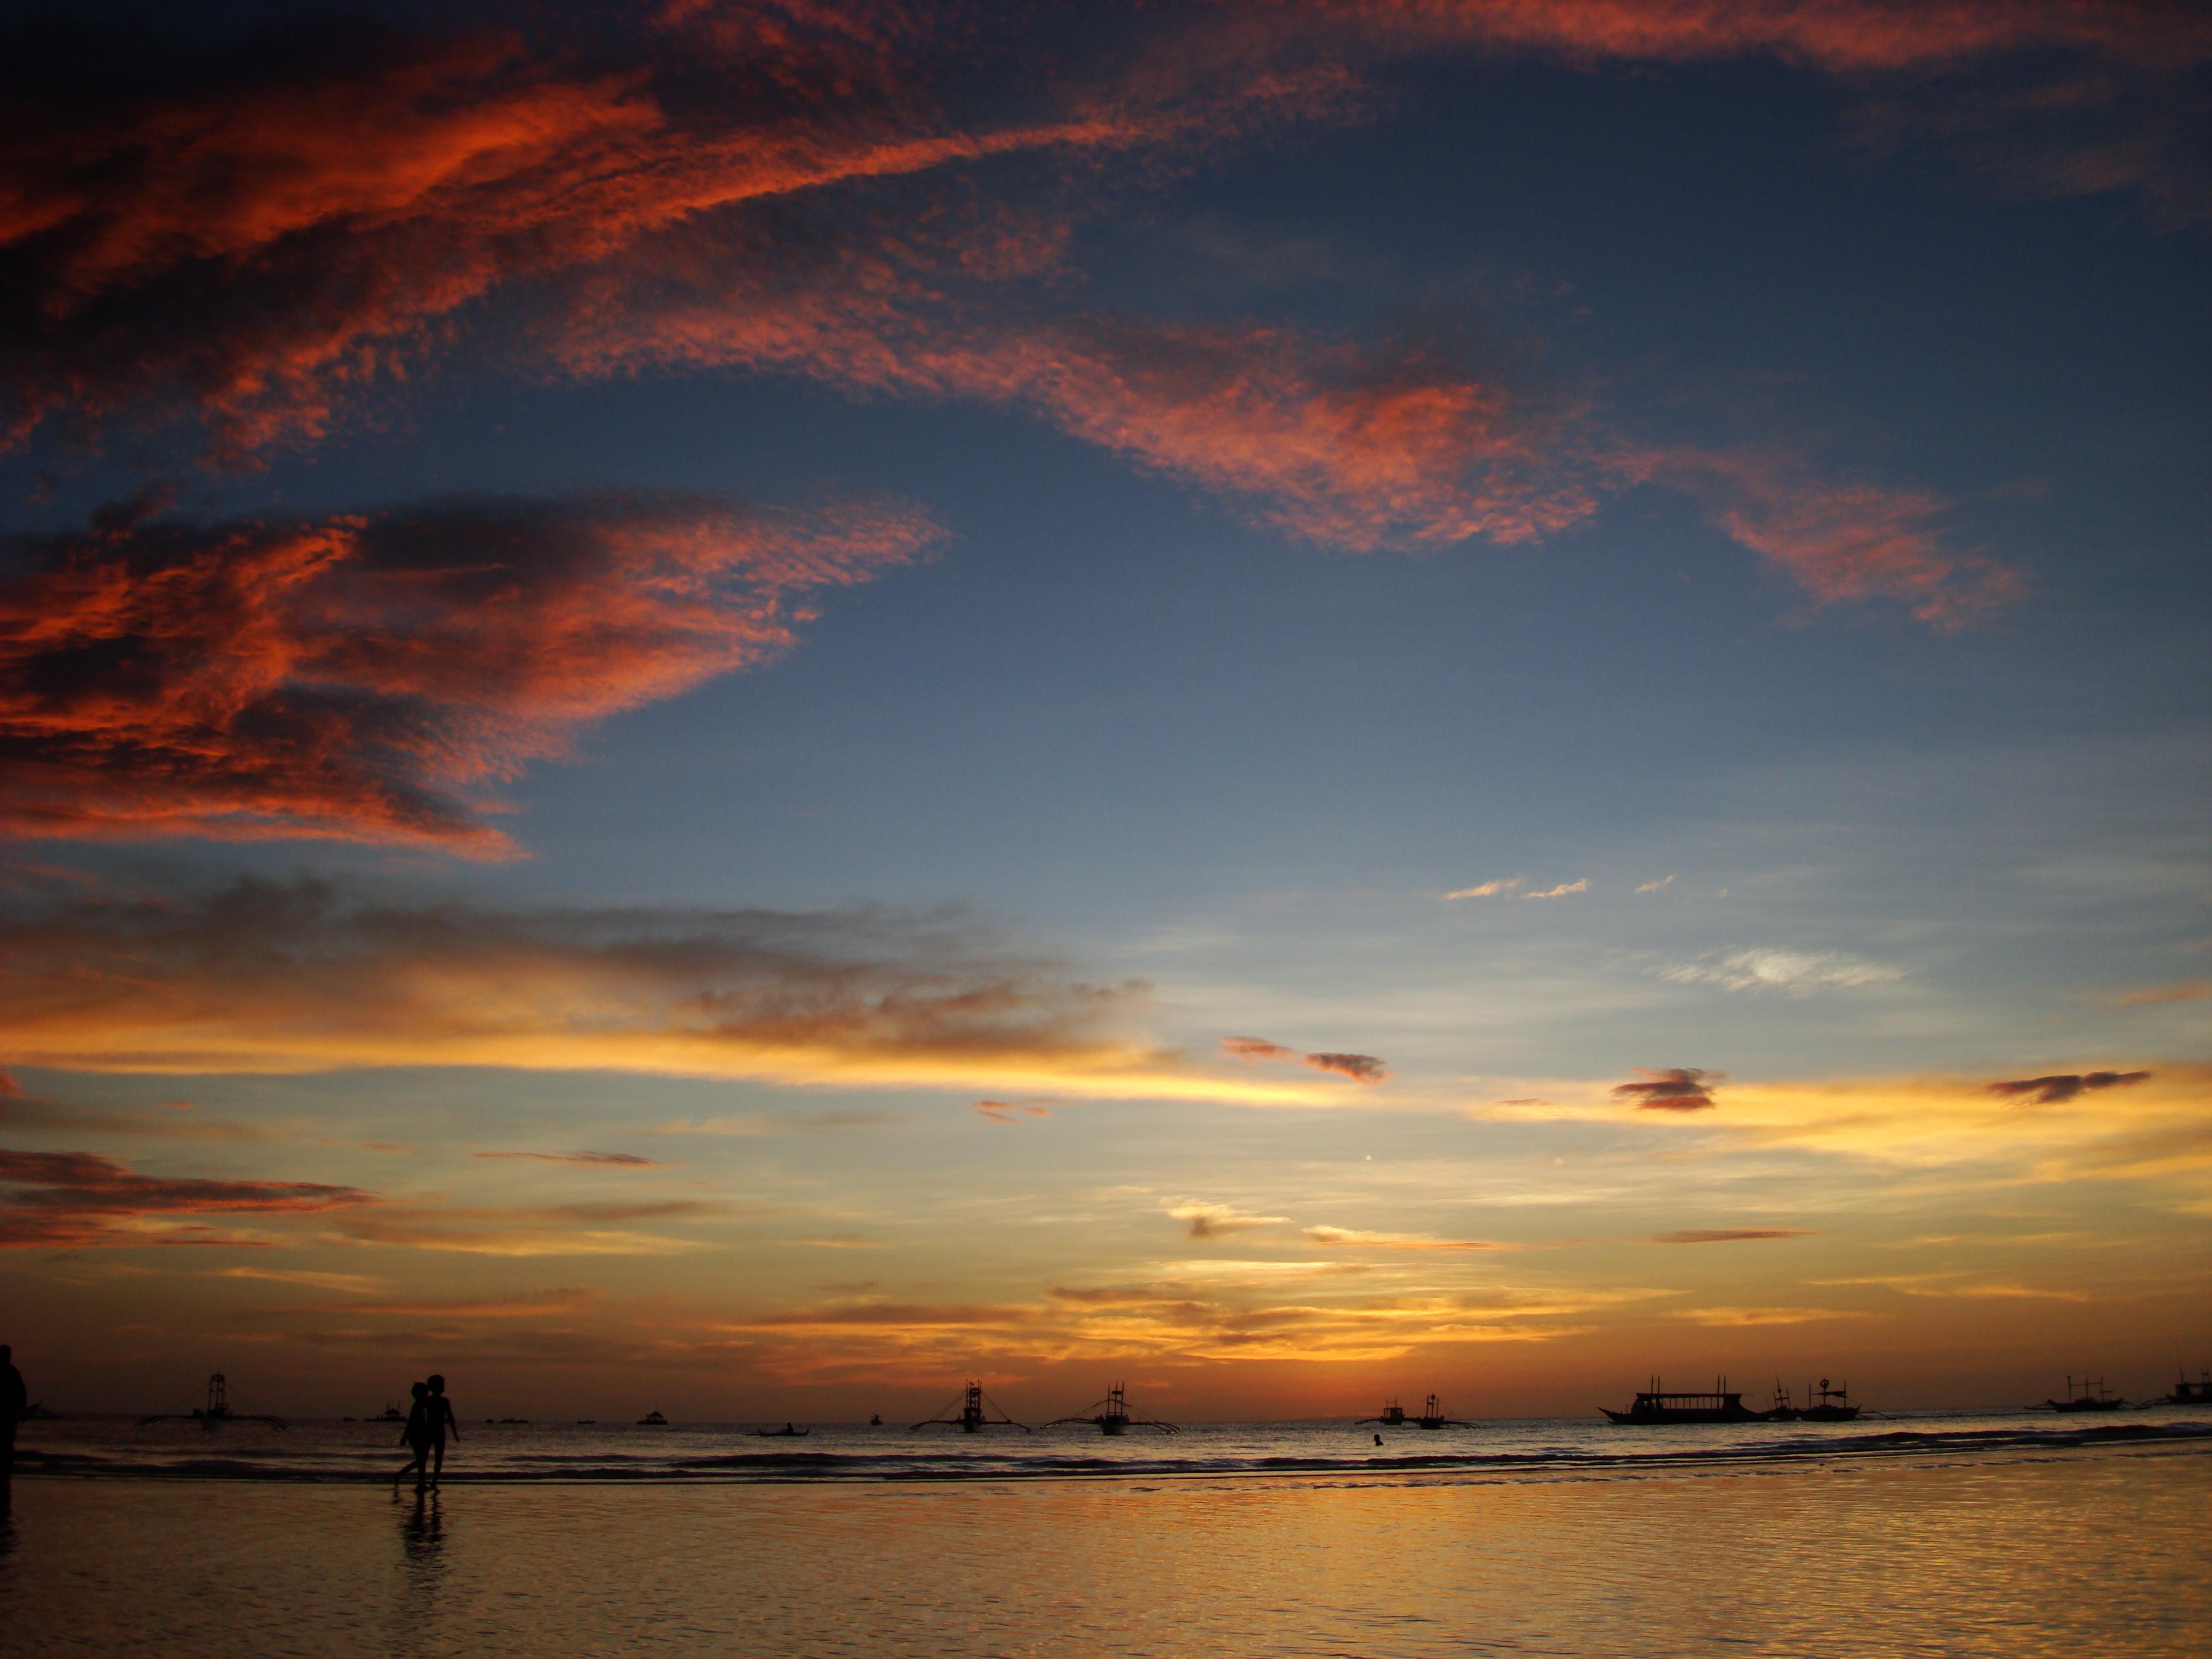 Sunset Philippines Boracay Beach 13